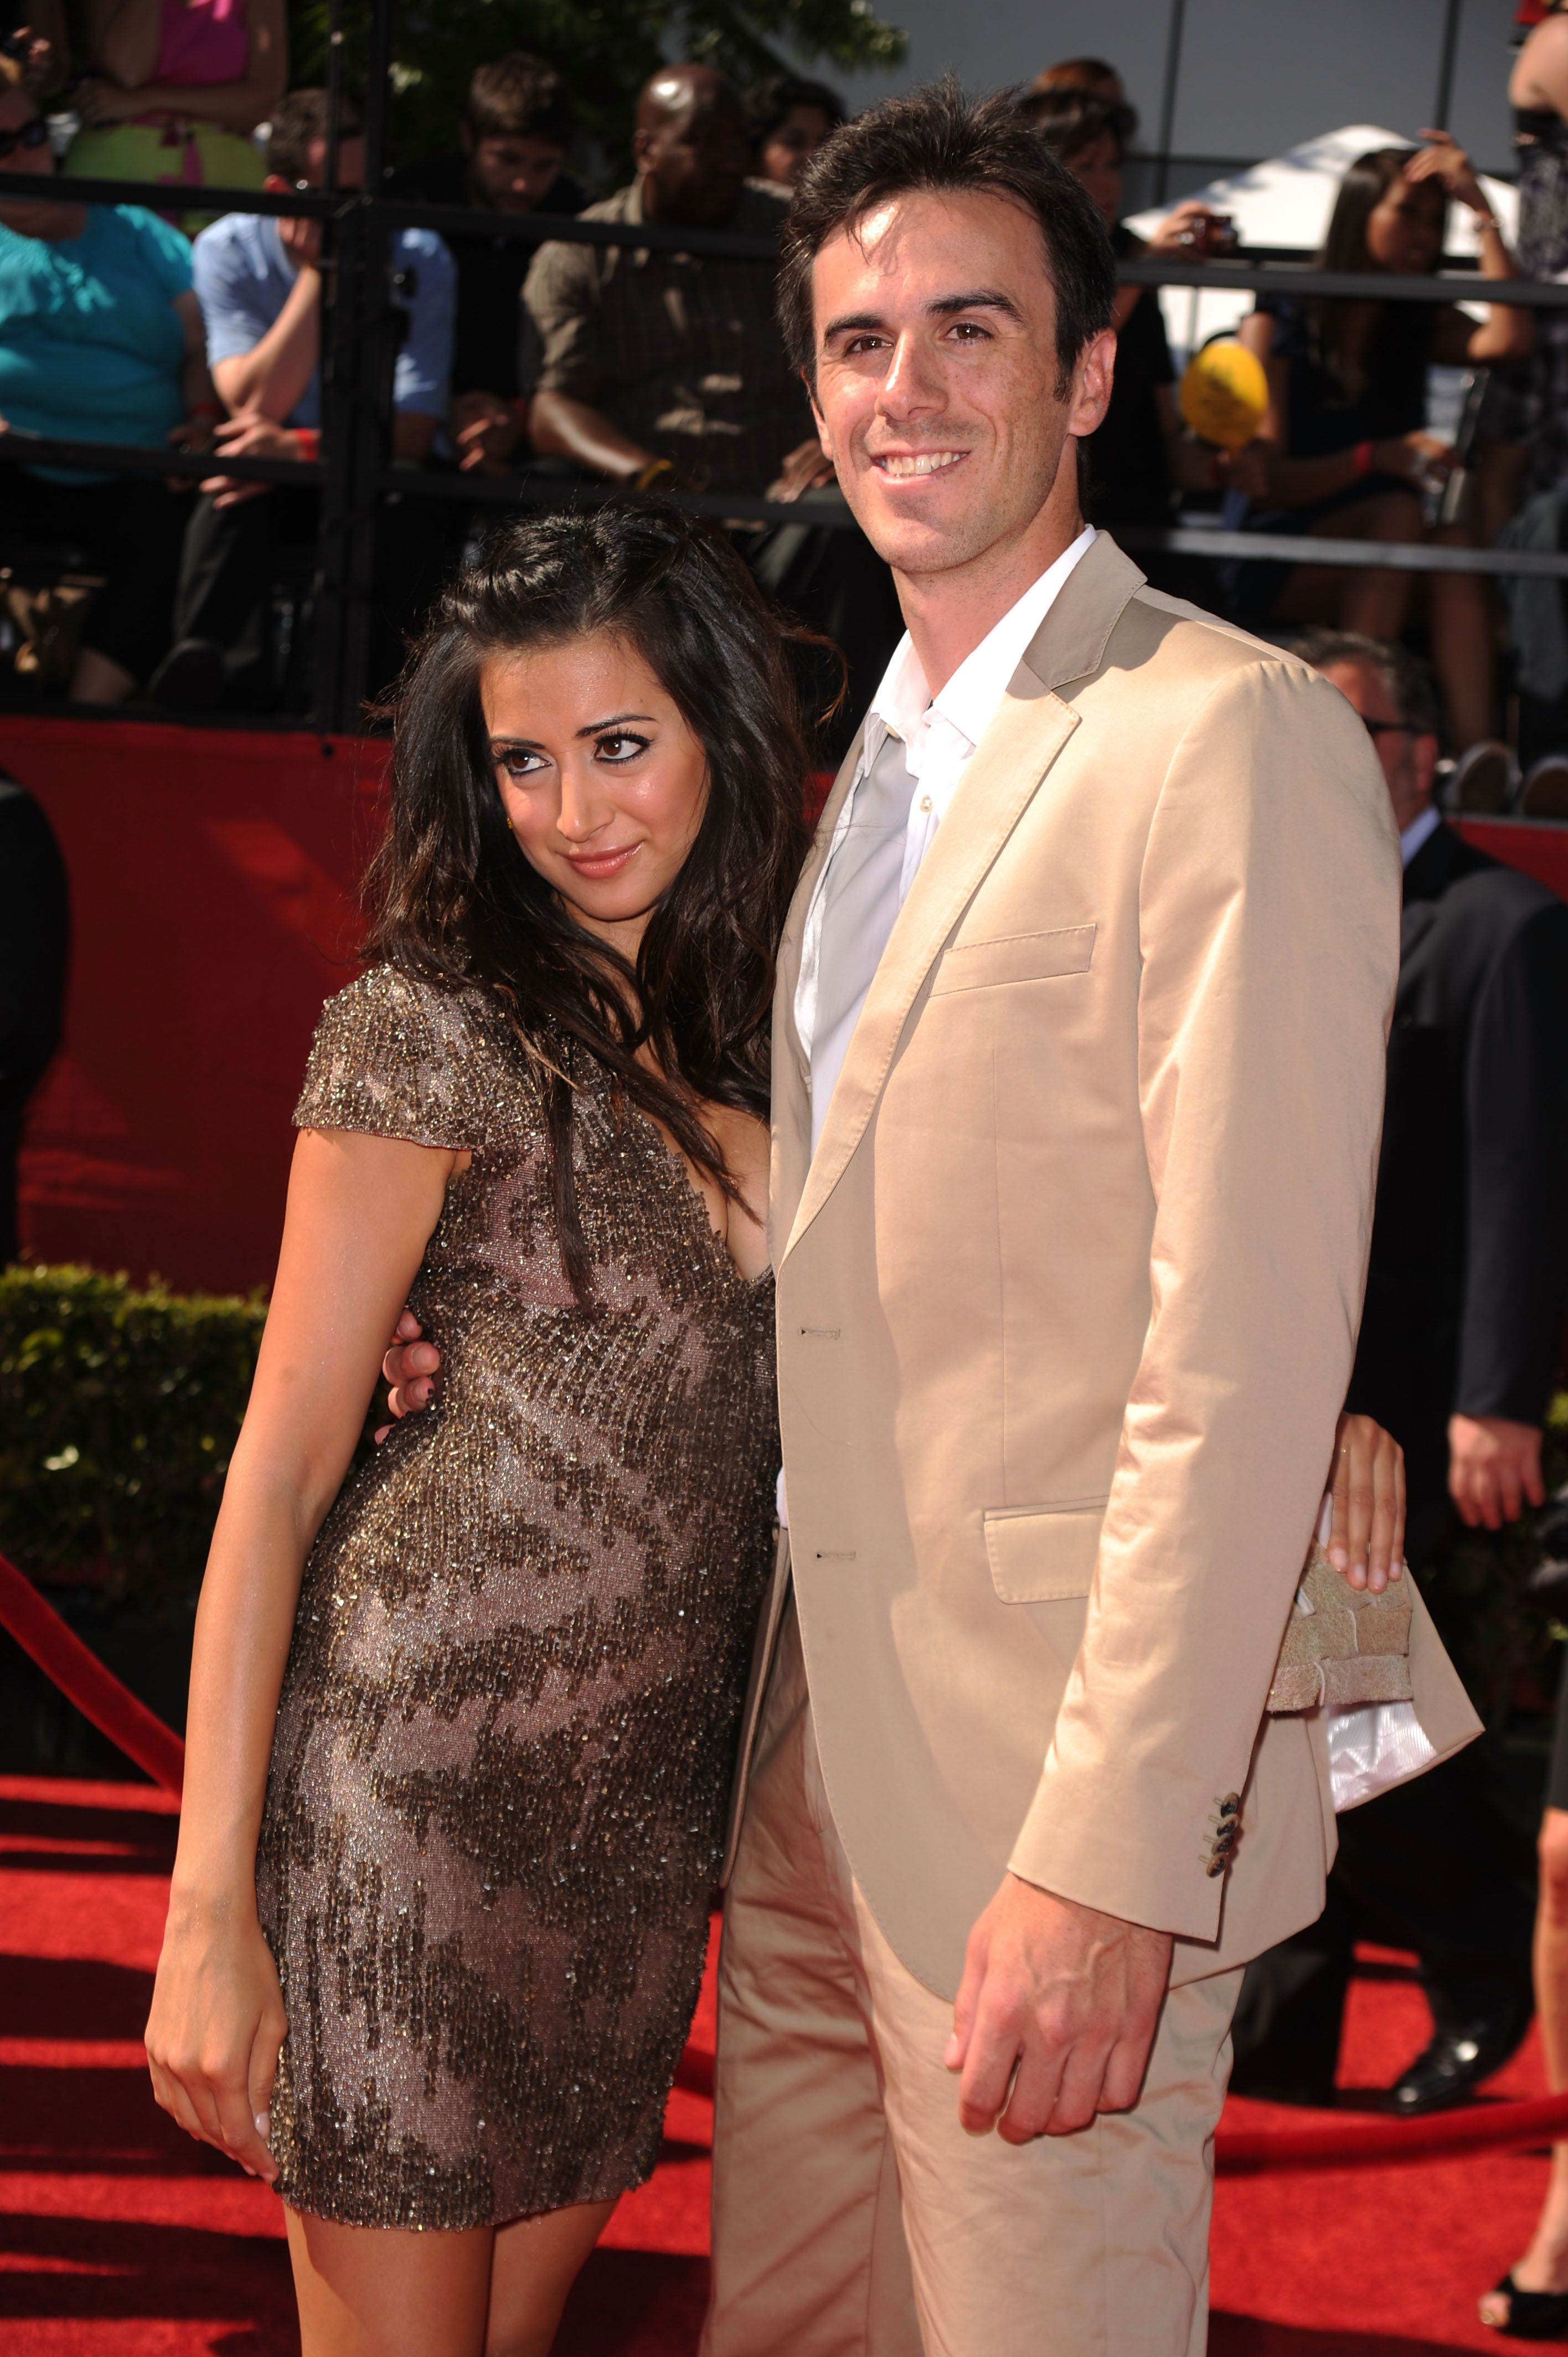 Actress Noureen Dewulf Wife Of Vancouver Canucks Goaltender Ryan